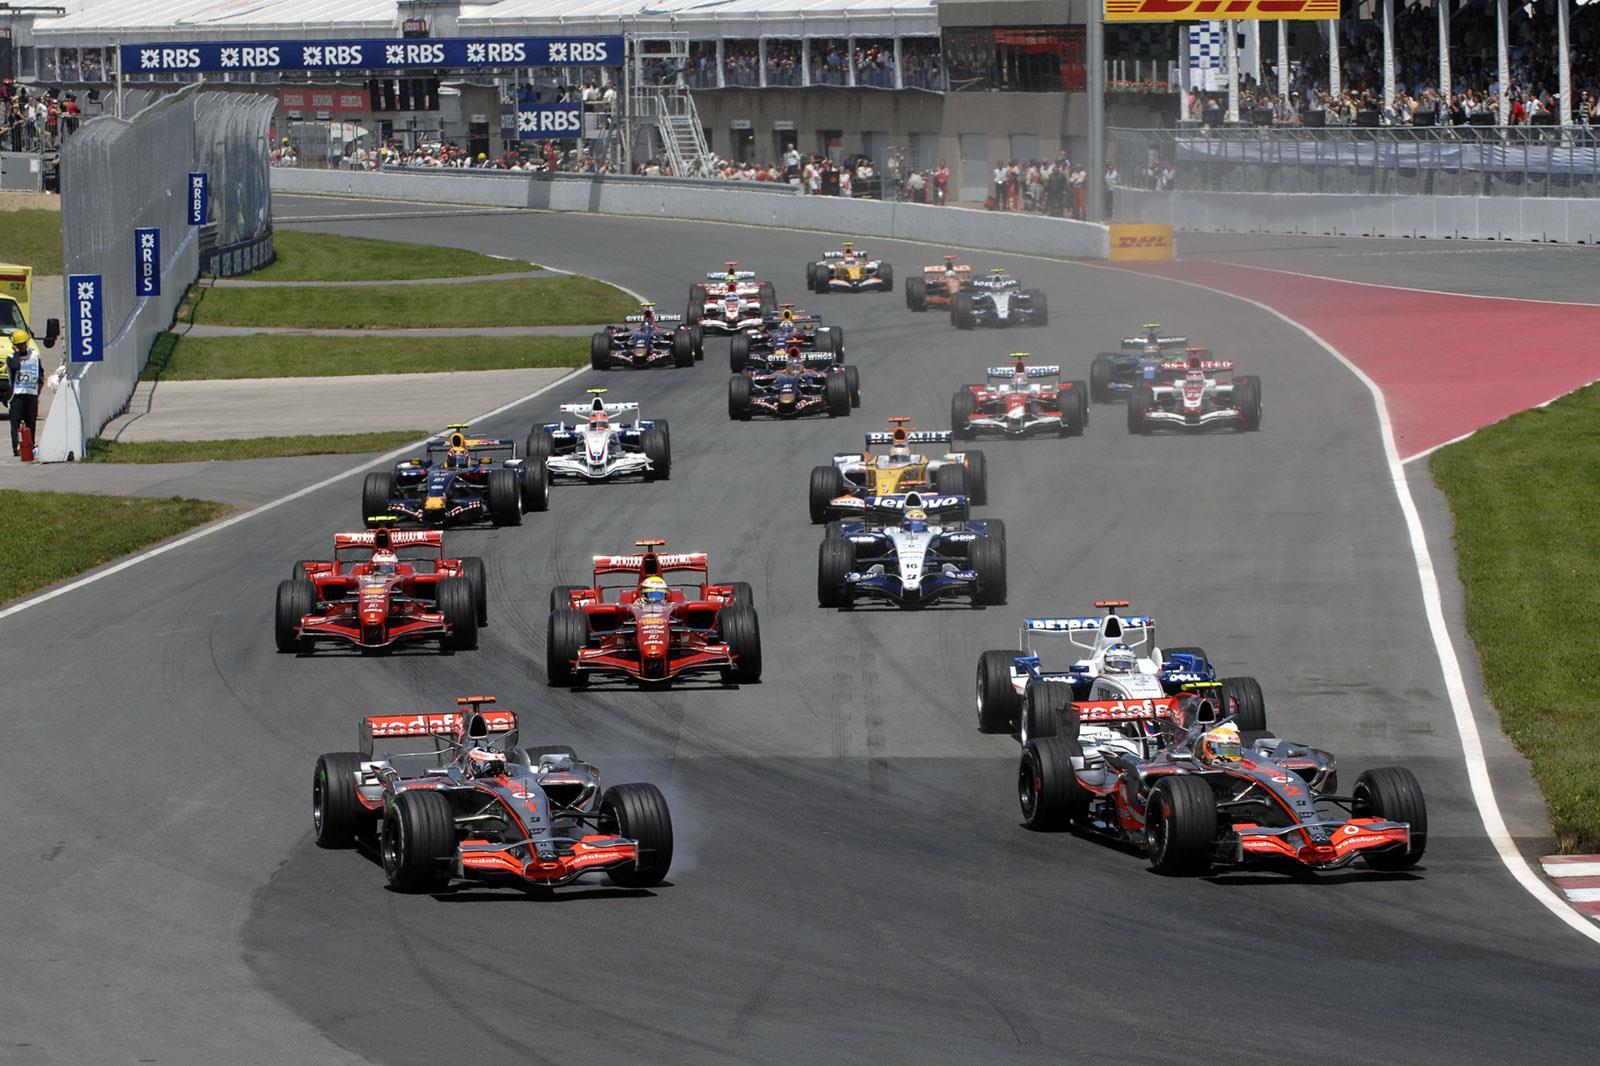 canadian-gp-f1-2007-start-foto-f1fansite